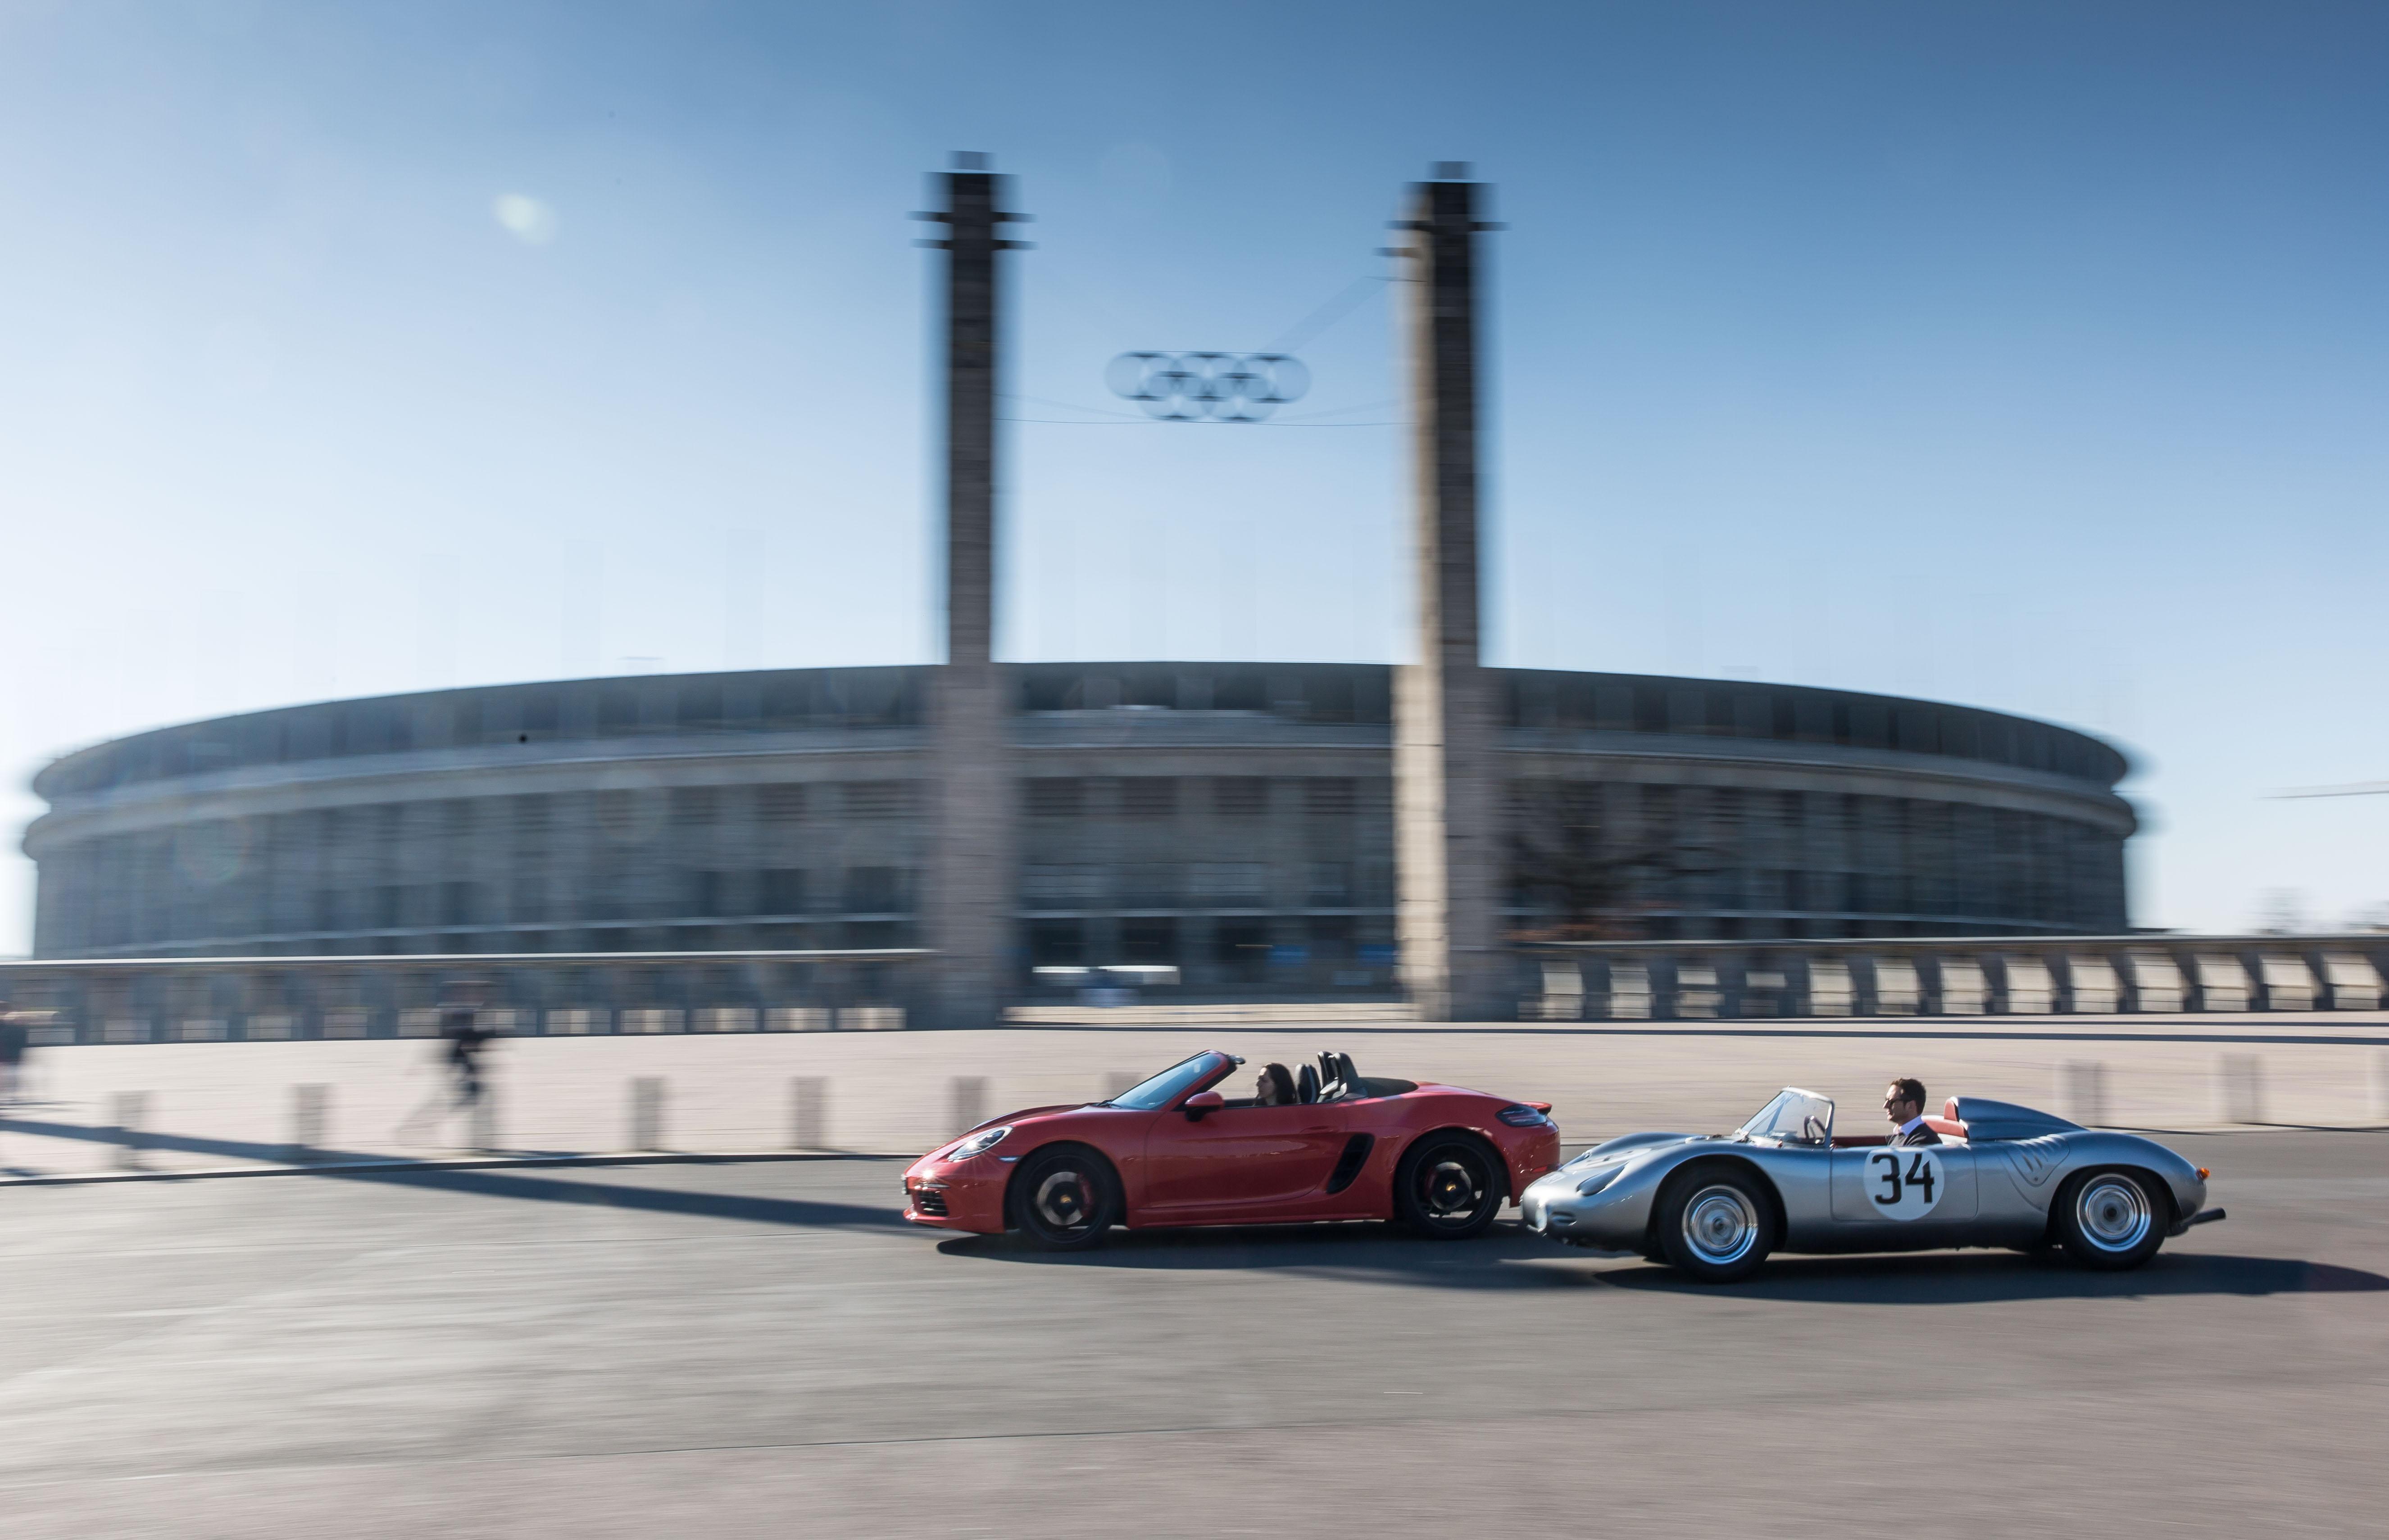 296 Der neue Boxter 718 RS Porsche Christophorus Nr